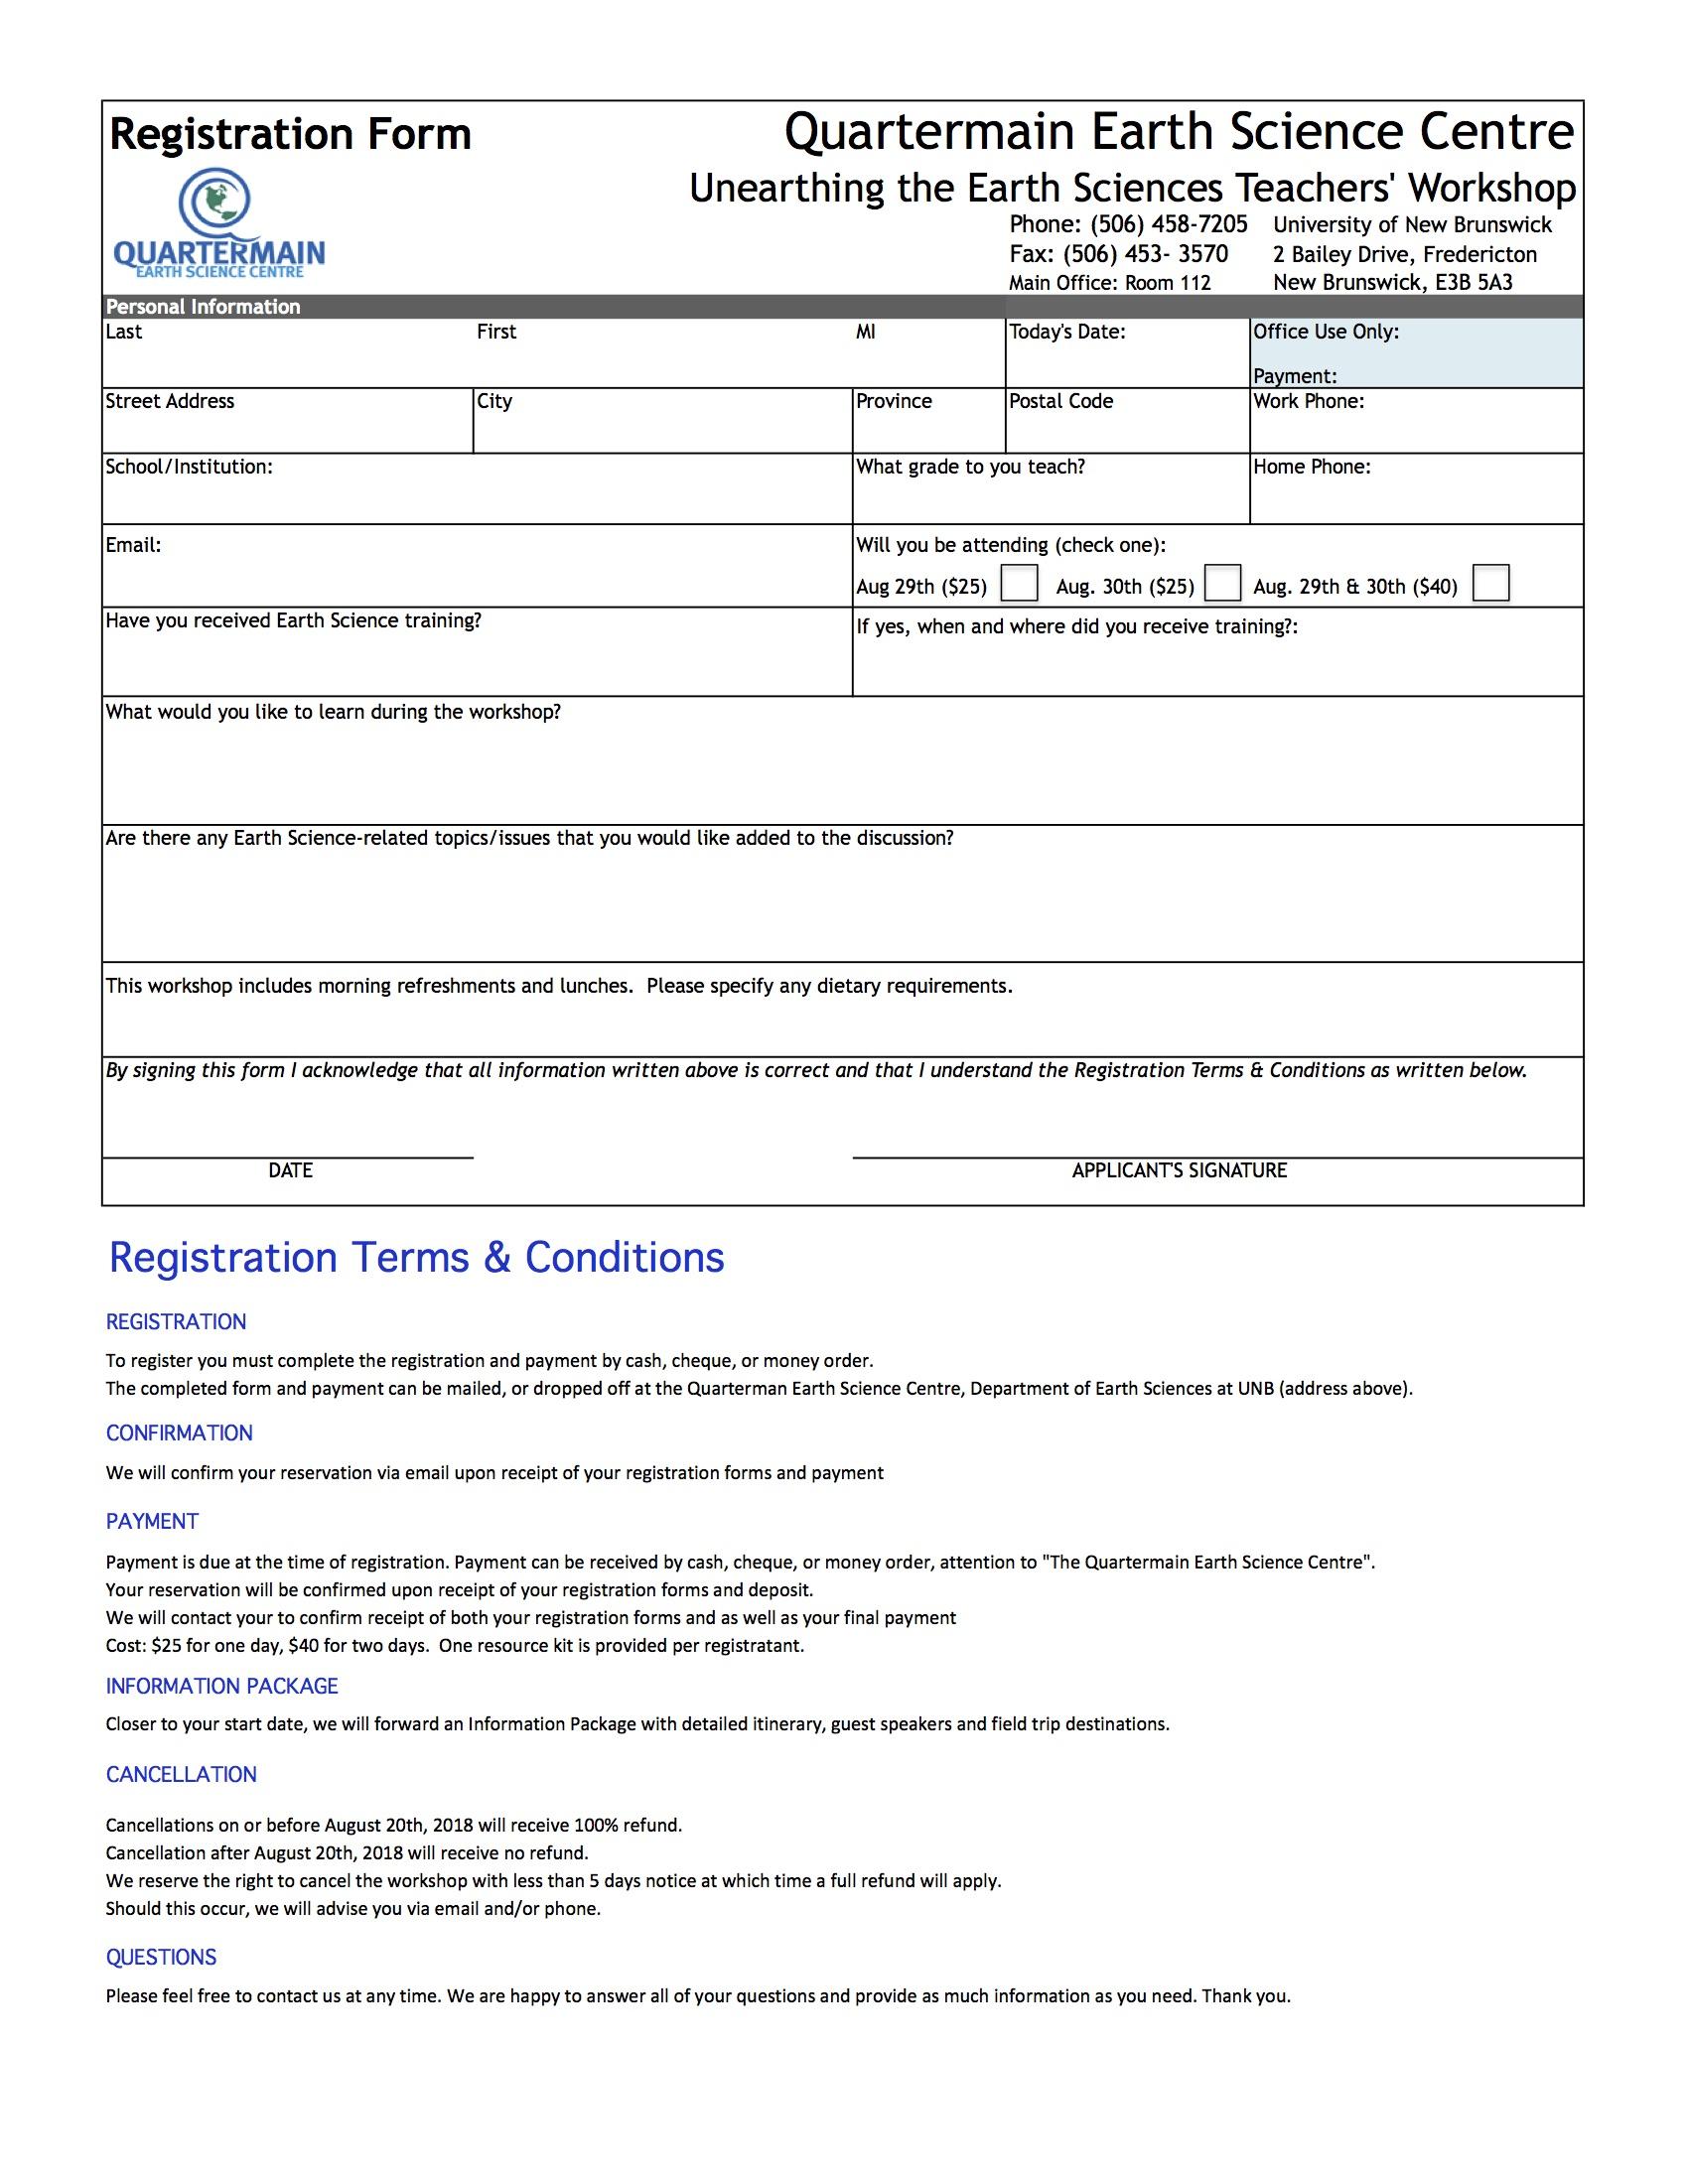 Teachers Workshop 2018 Registration Brochure page 3of3.jpg